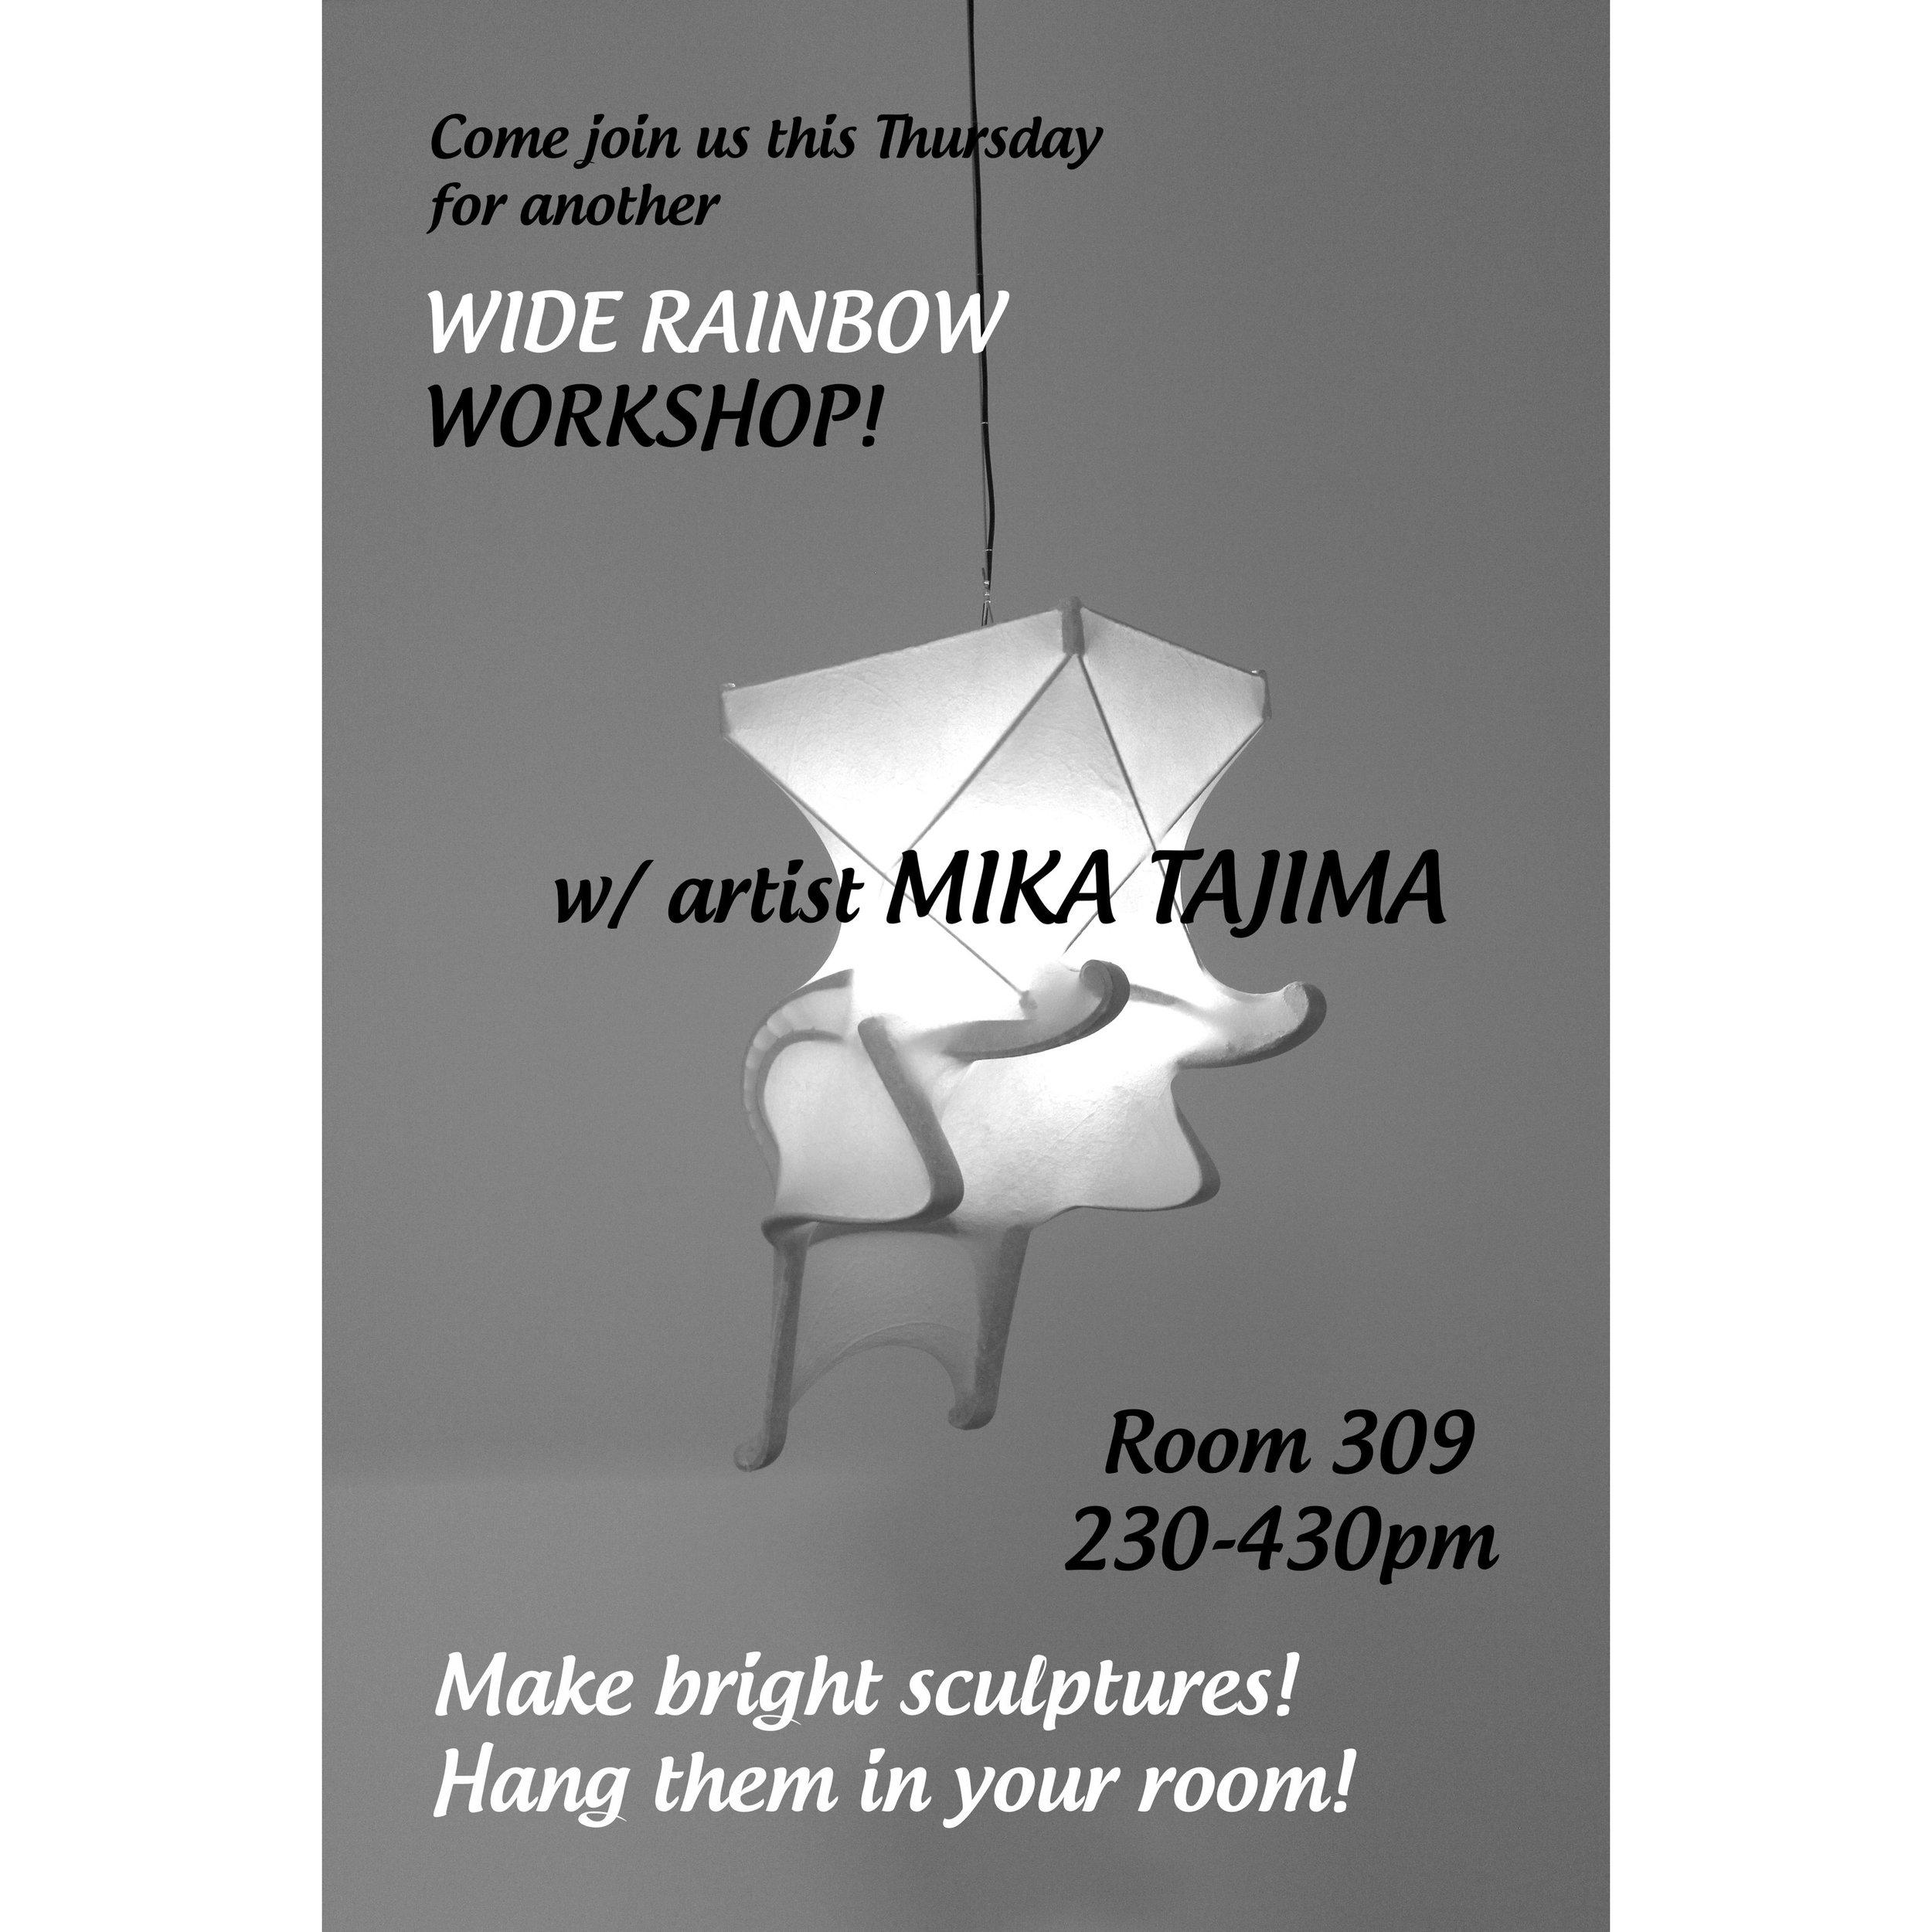 Mika Tajima Wide Rainbow Workshop Flyer